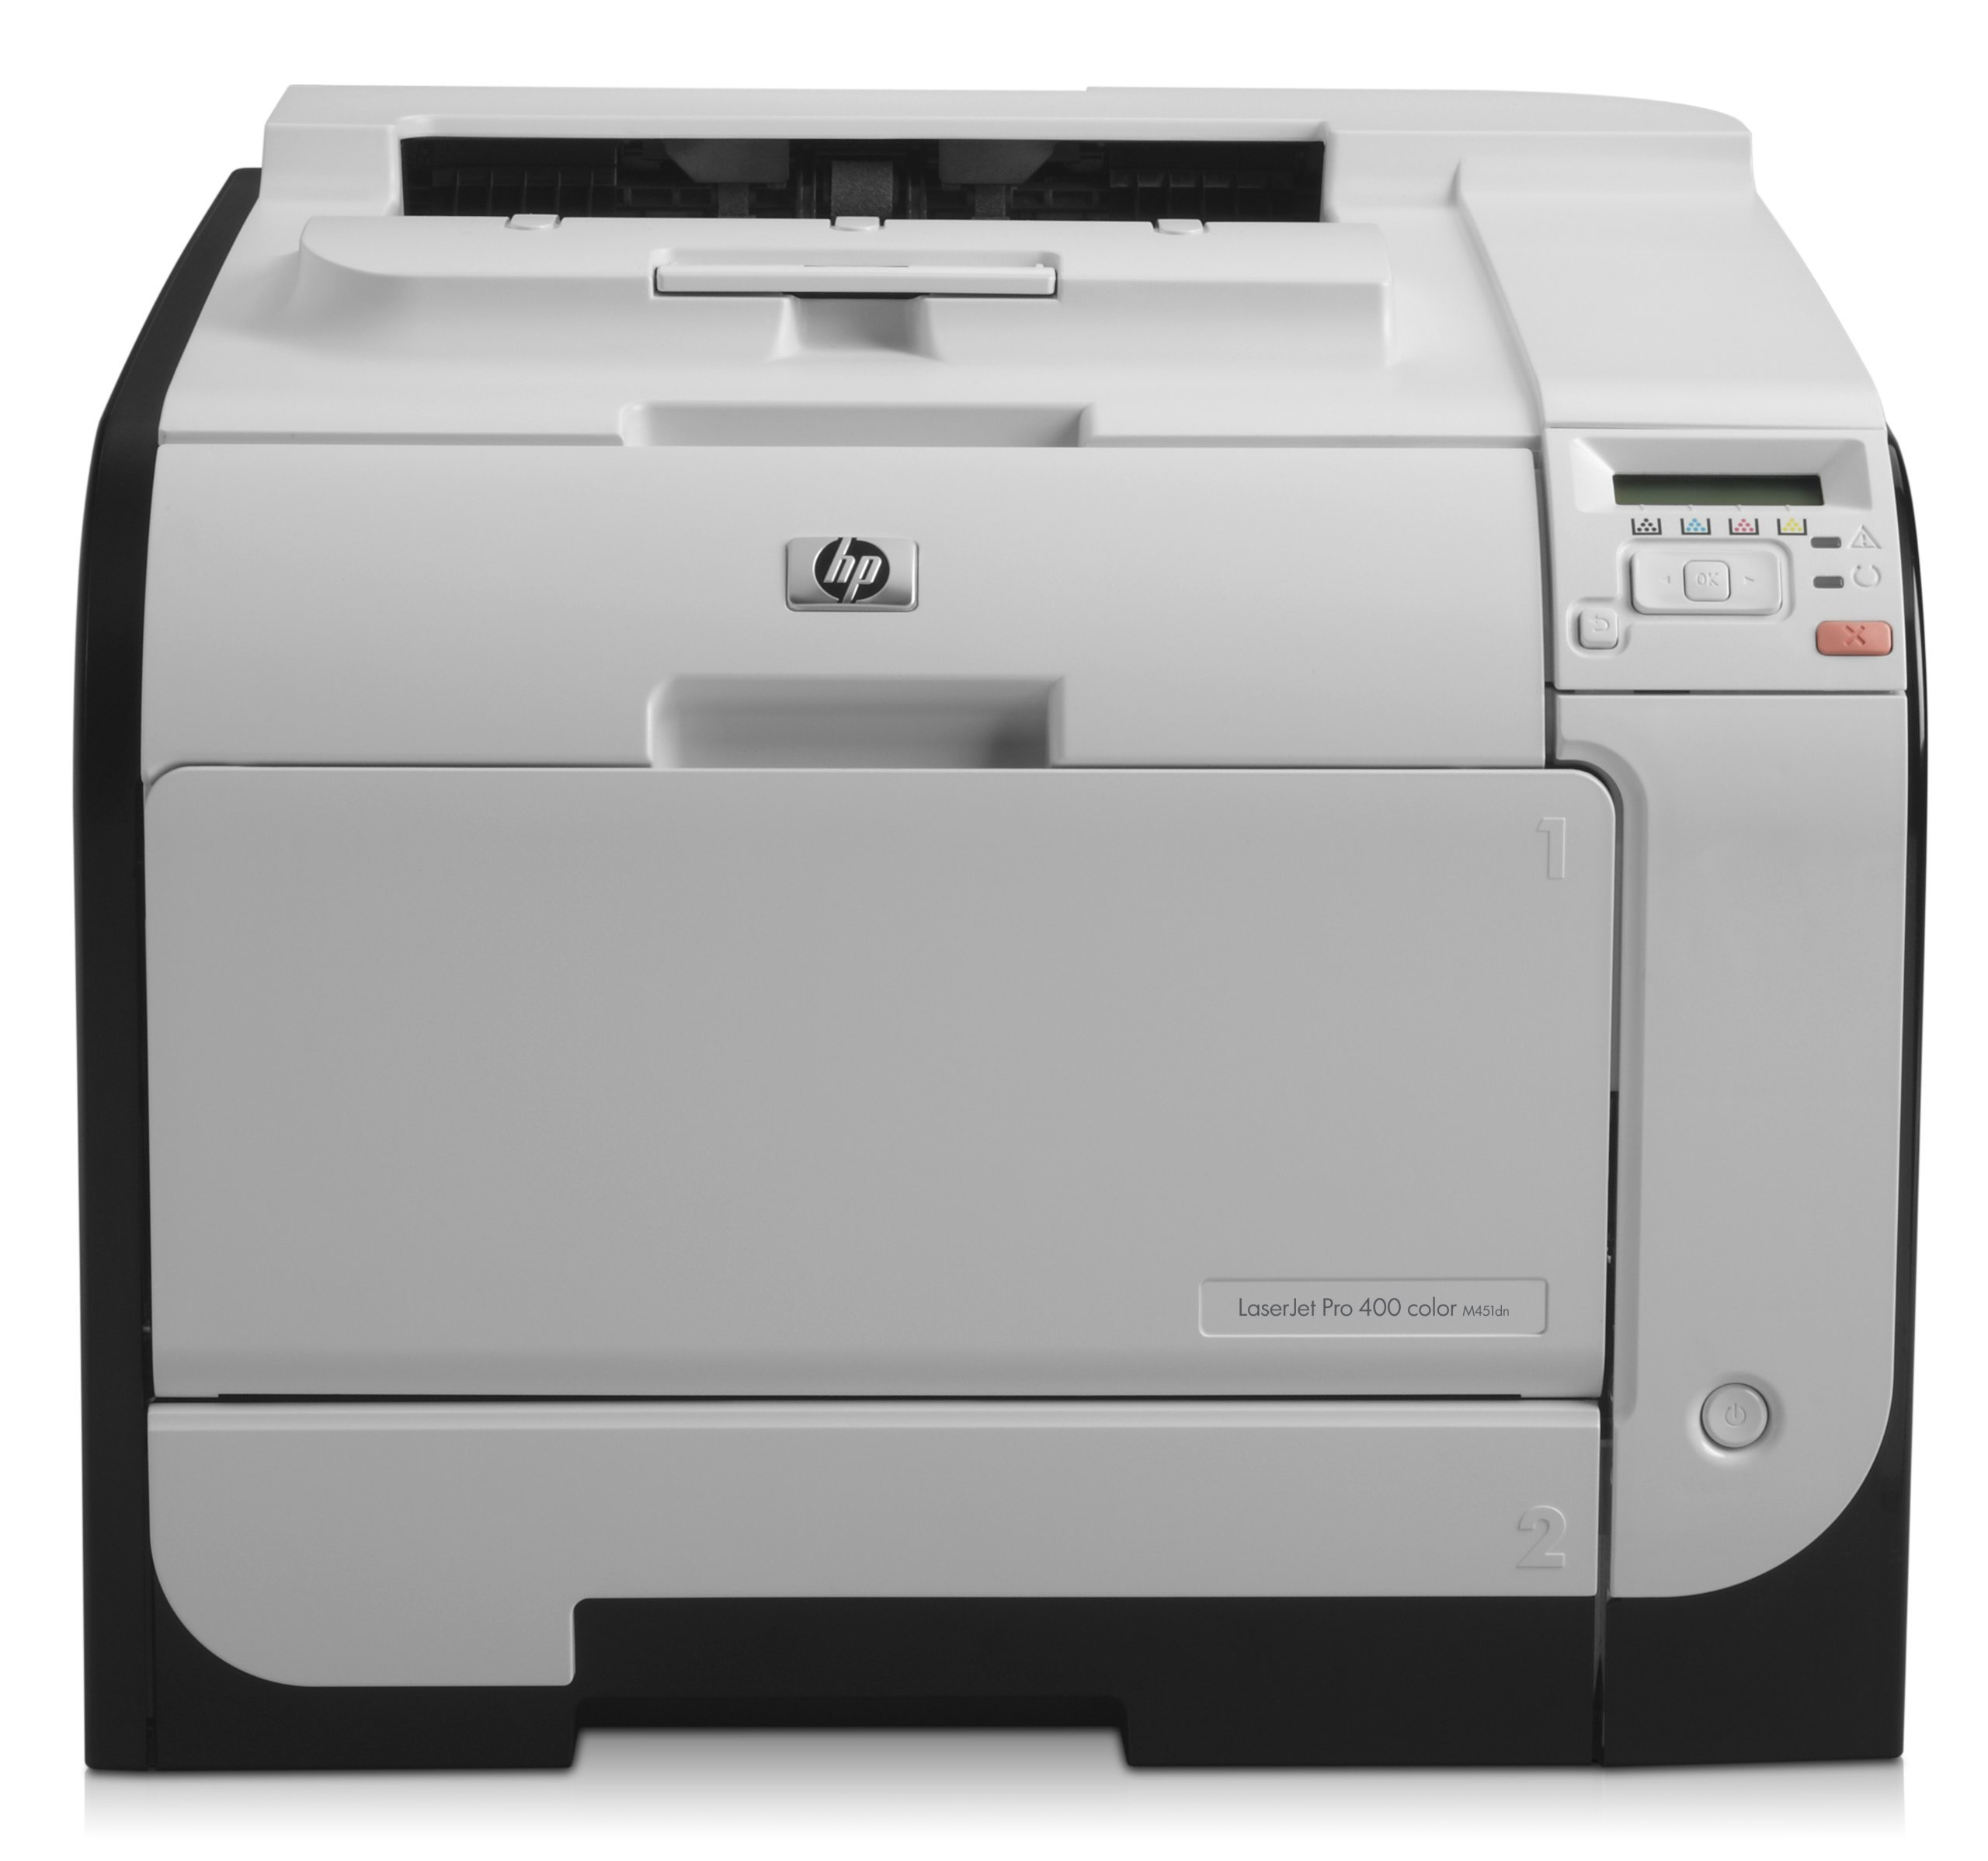 HP LaserJet Pro 400 m451dn Duplex Color Laser Printer (Renewed) by HP (Image #1)